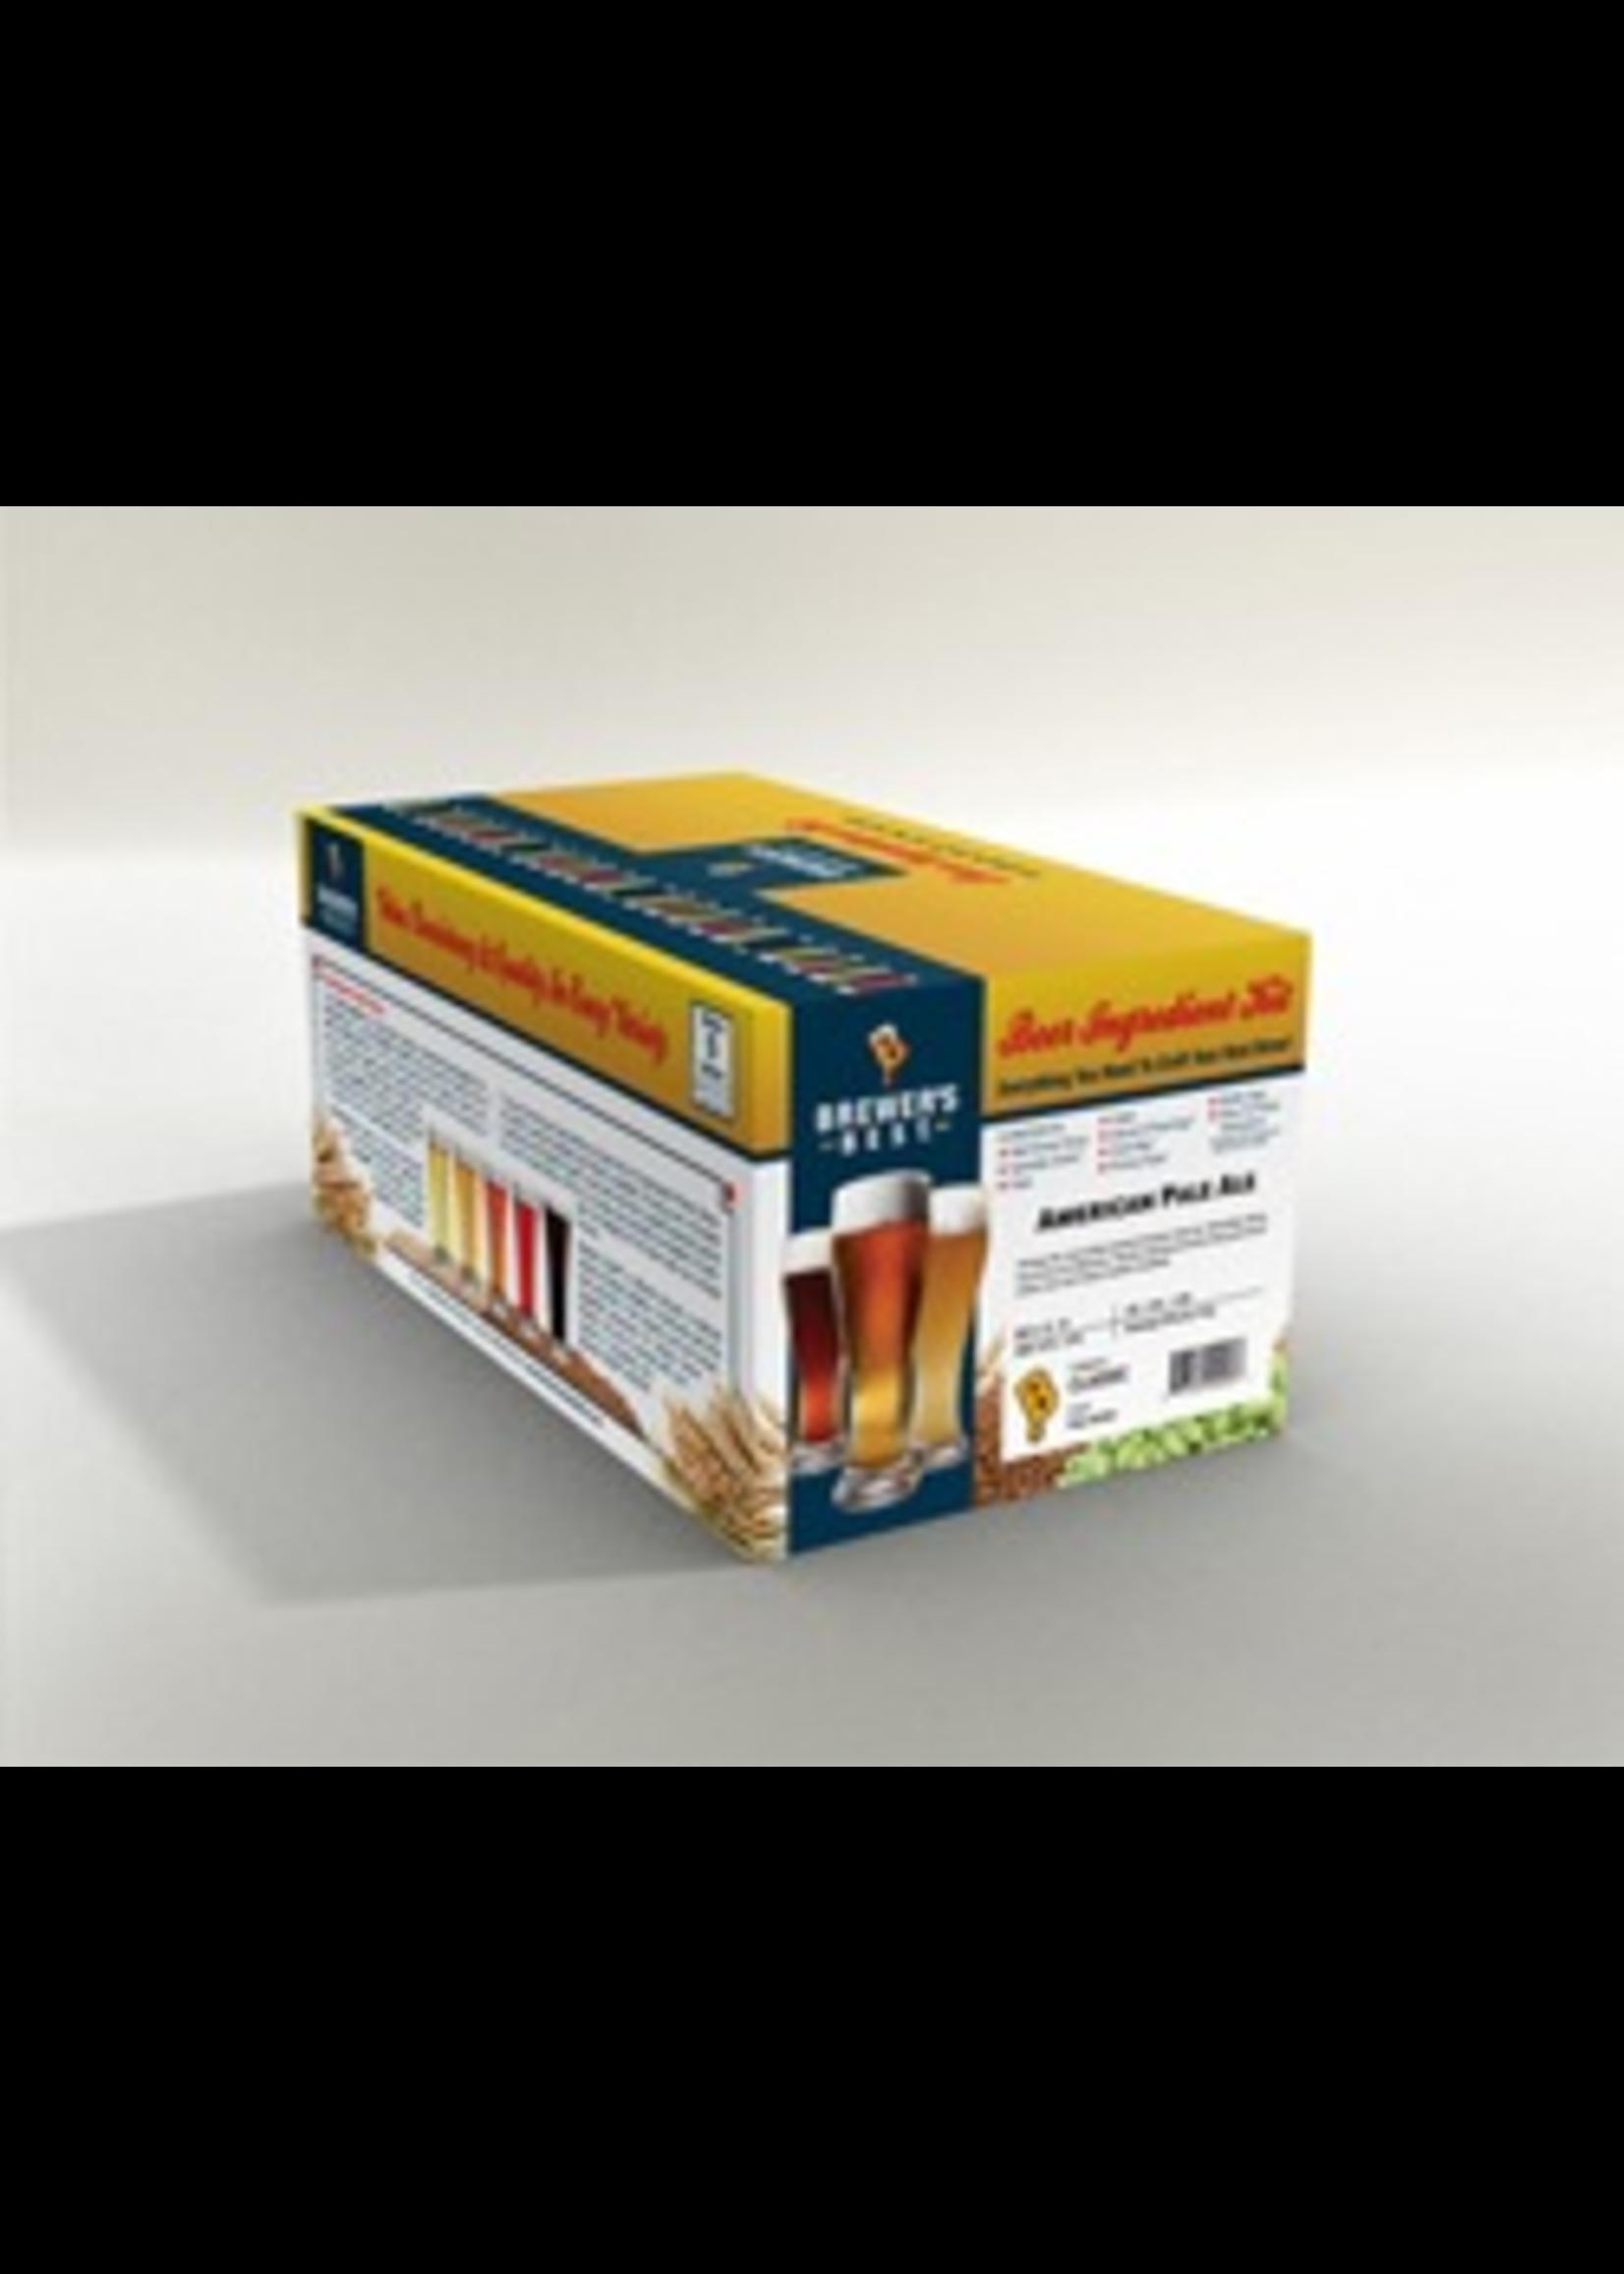 Ingredient Kits Brewer's Best Belgian Tripel - 5 Gallon Ingredient Kit